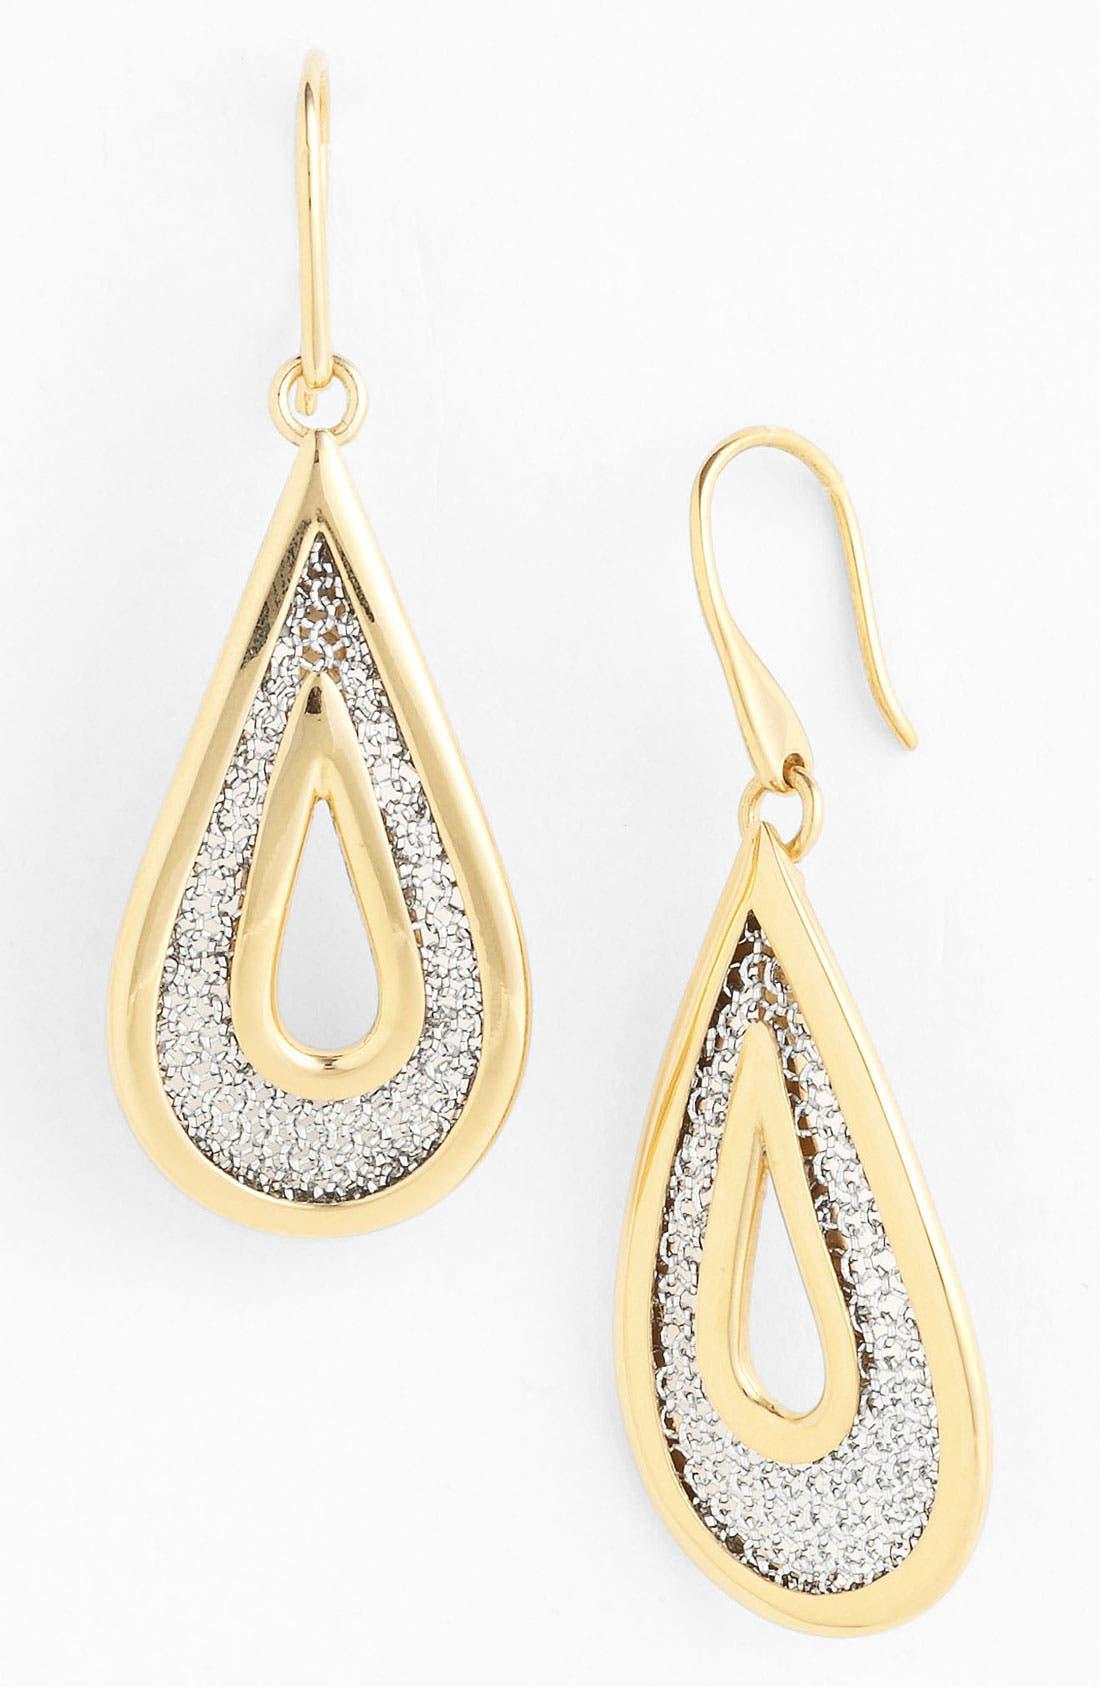 Main Image - Adami & Martucci 'Mesh' Small Open Teardrop Earrings (Nordstrom Exclusive)